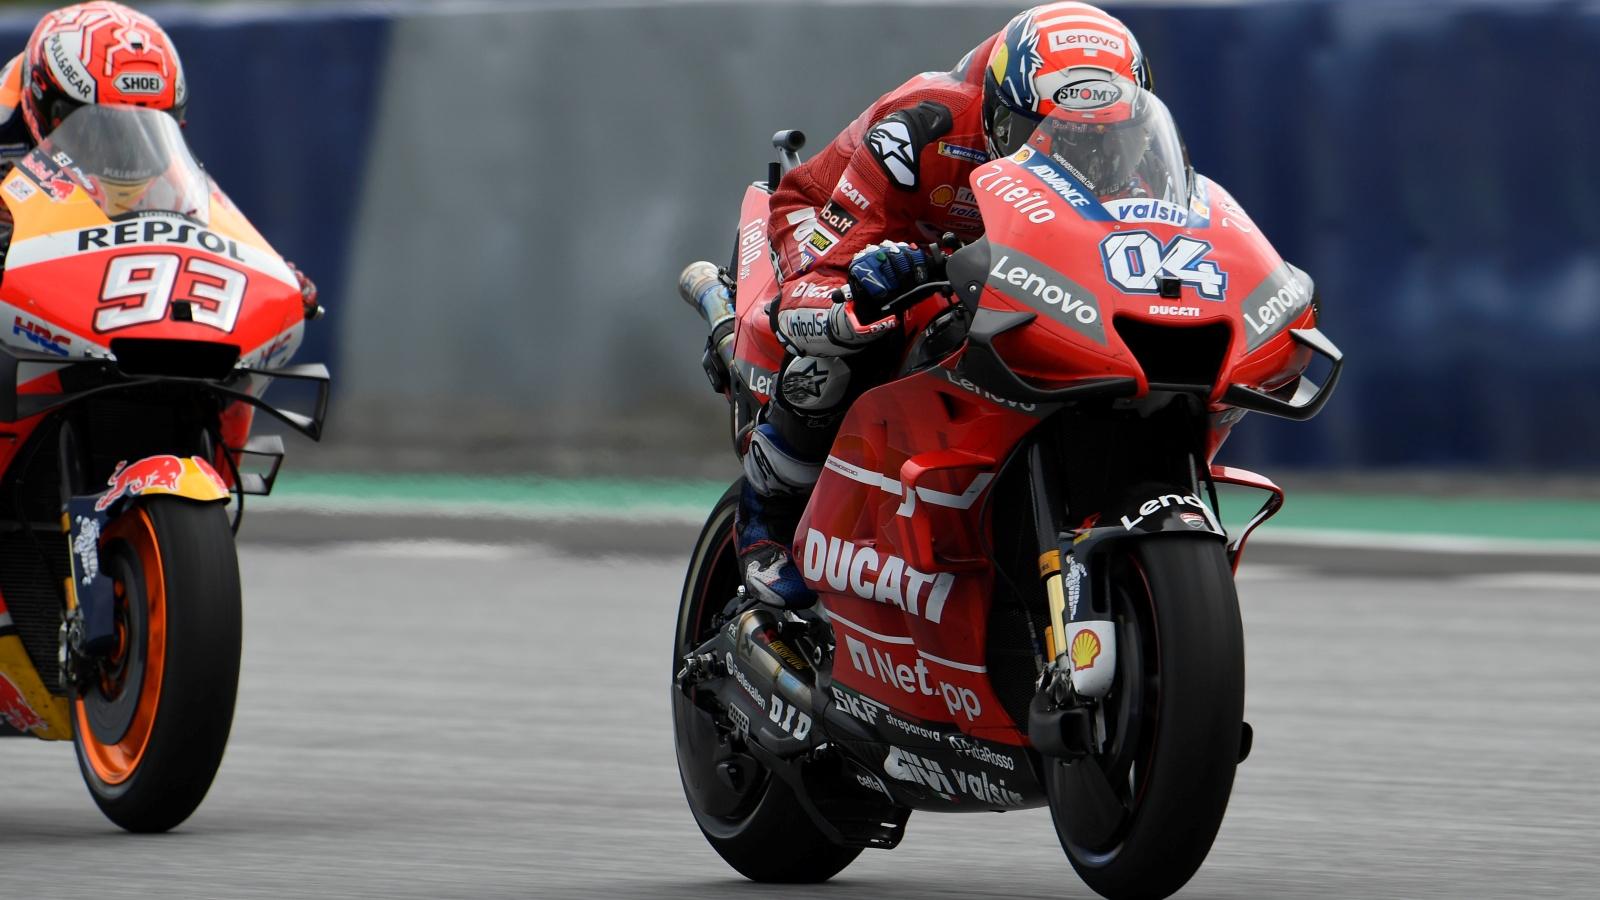 Andrea Dovizioso vs Marc Márquez, MotoGP Austria 2019